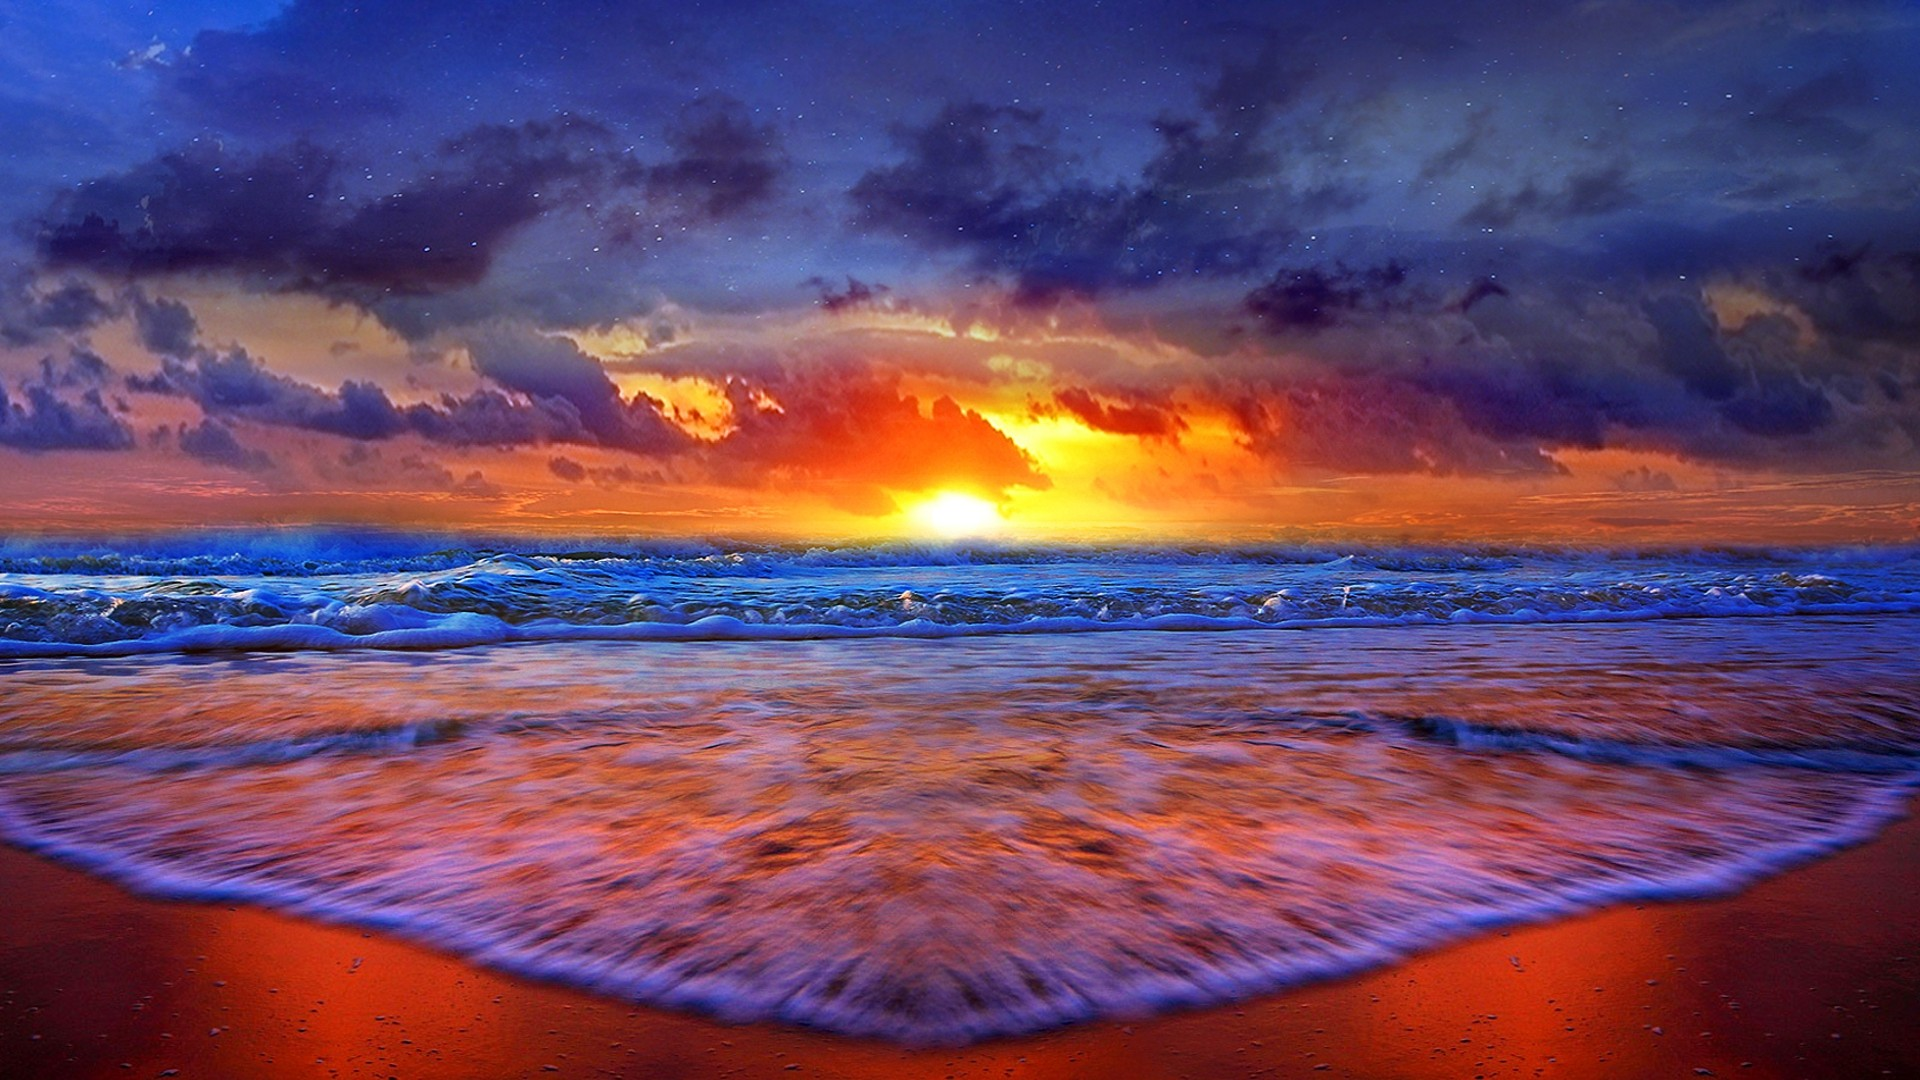 The Sunset HD Desktop Background